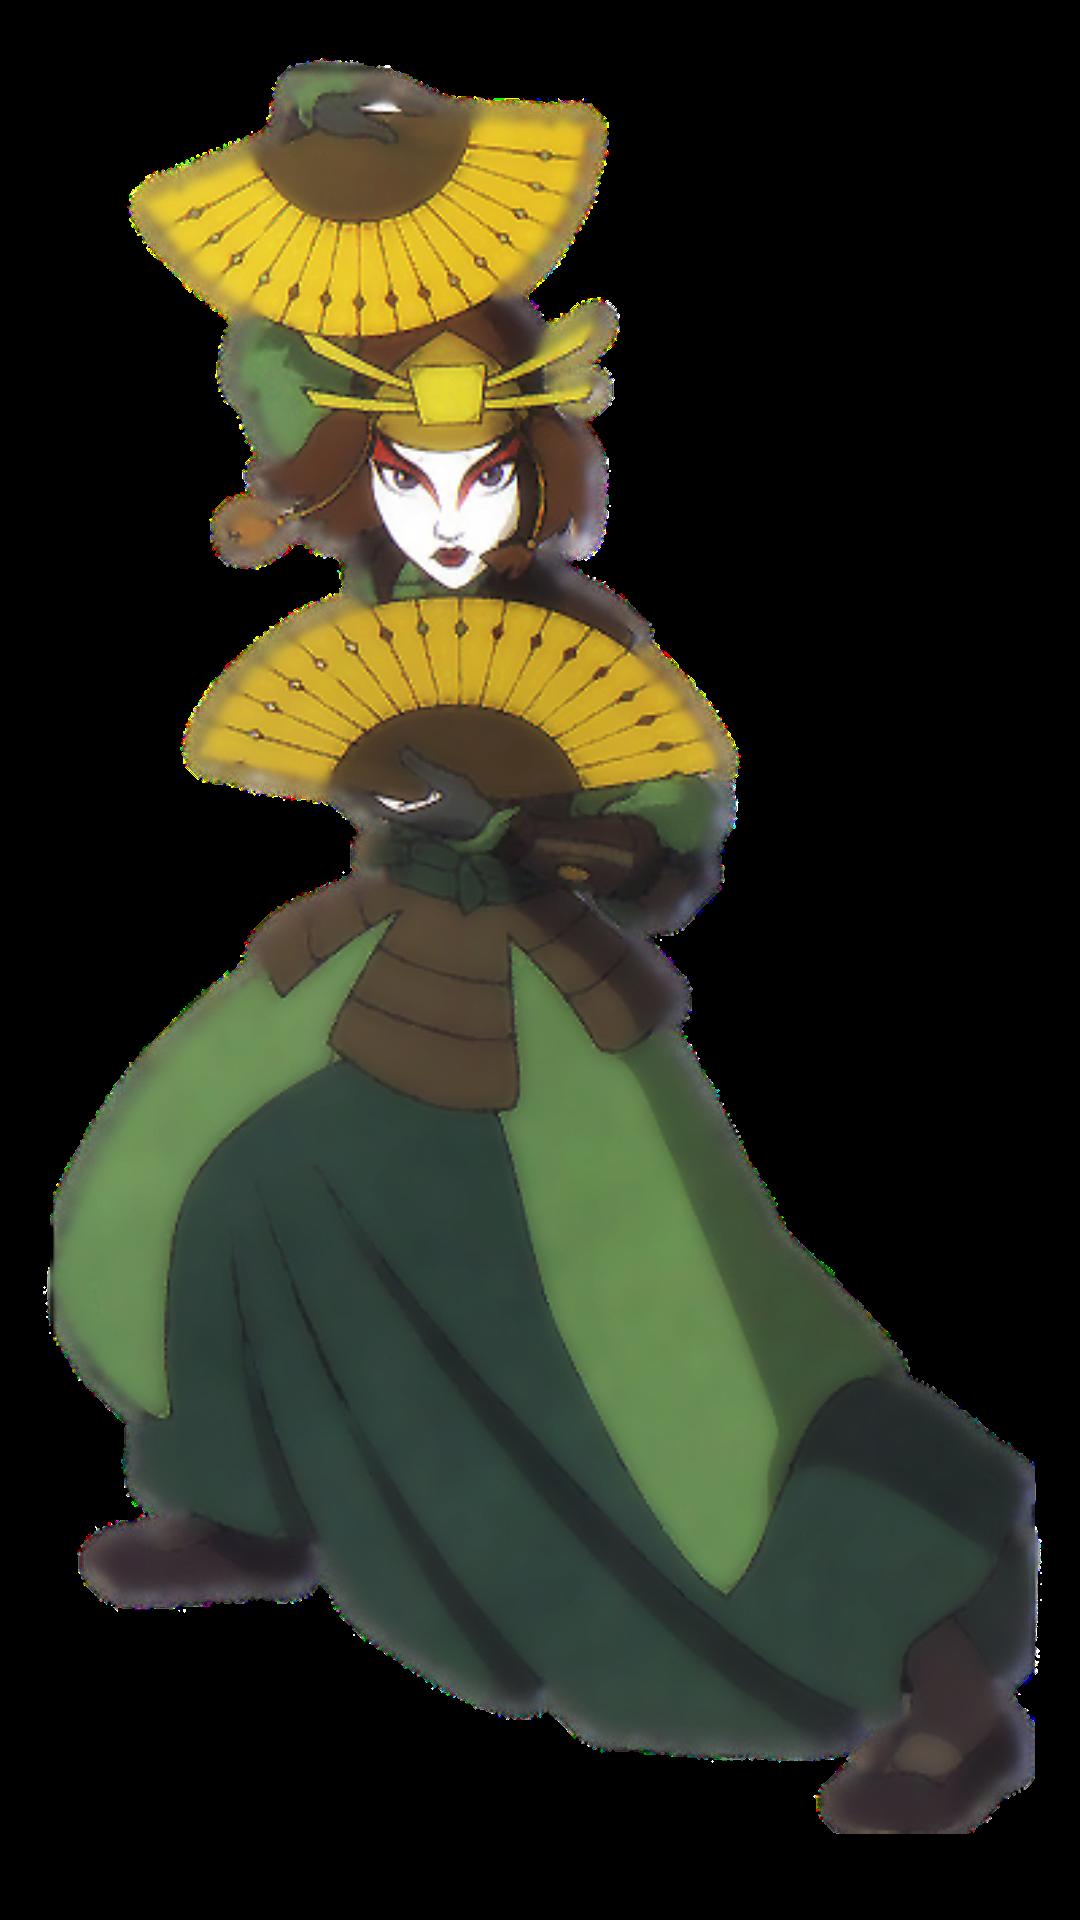 Suki (Avatar: The Last Airbender)